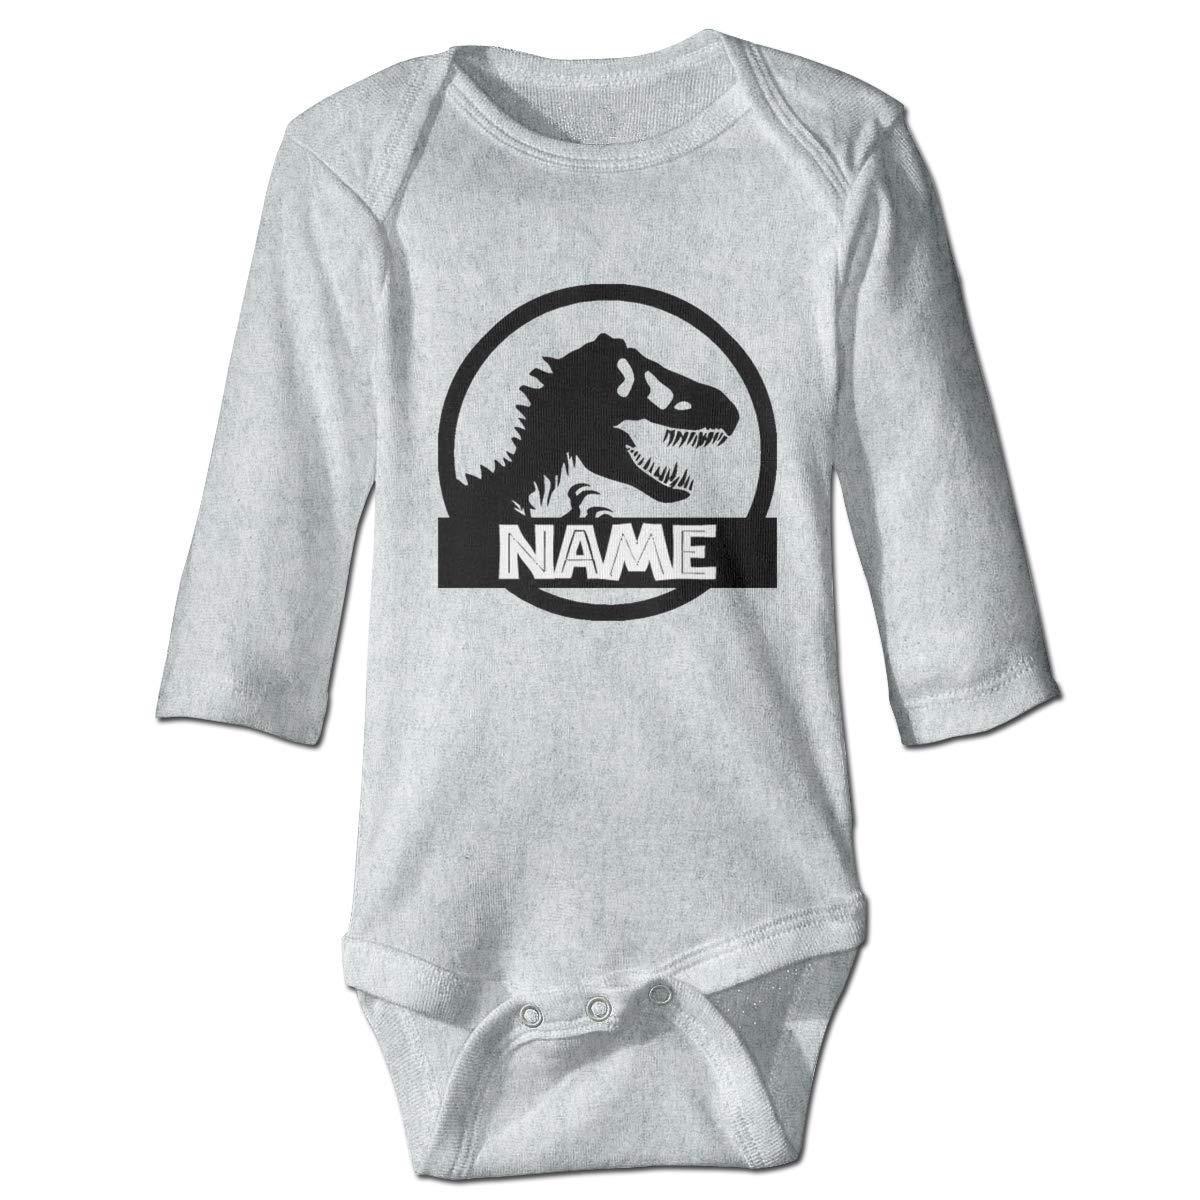 Dfenere Your Name Retro Newborn Baby Long Sleeve Bodysuit Romper Infant Summer Clothing